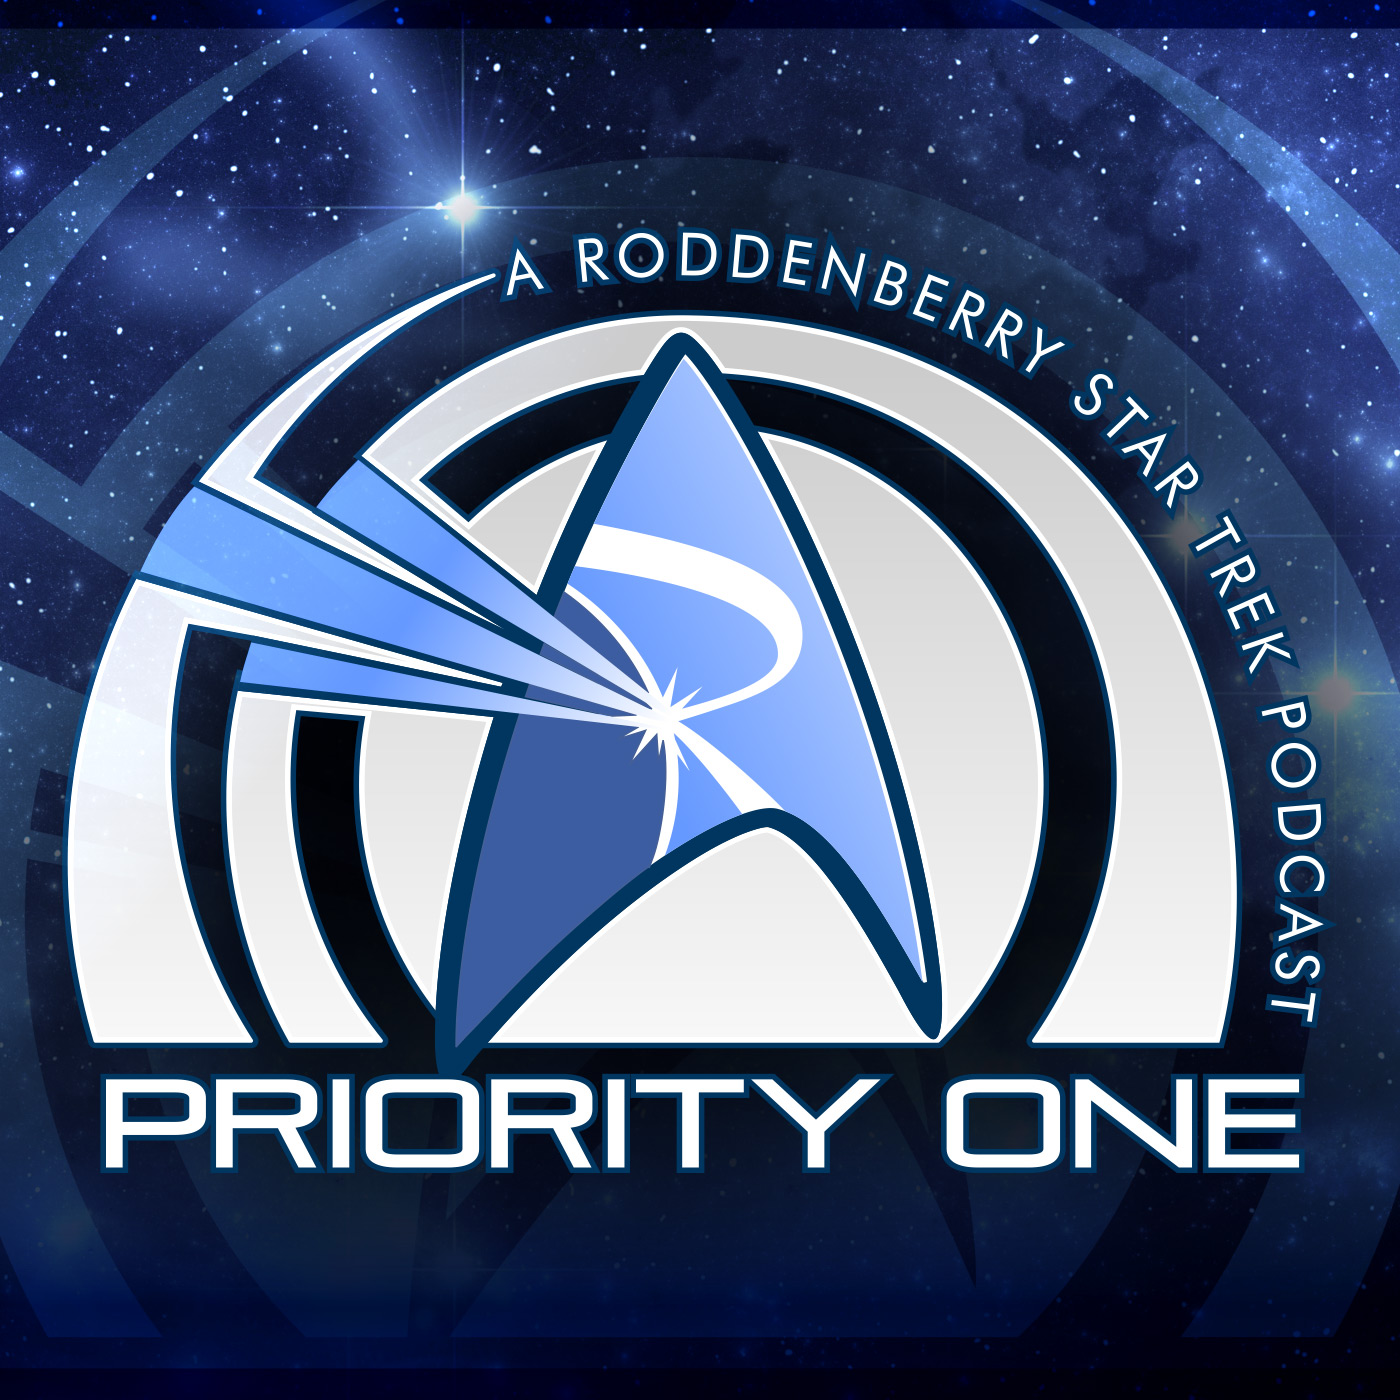 Artwork for 374 - Excelsior | Priority One: A Roddenberry Star Trek Podcast